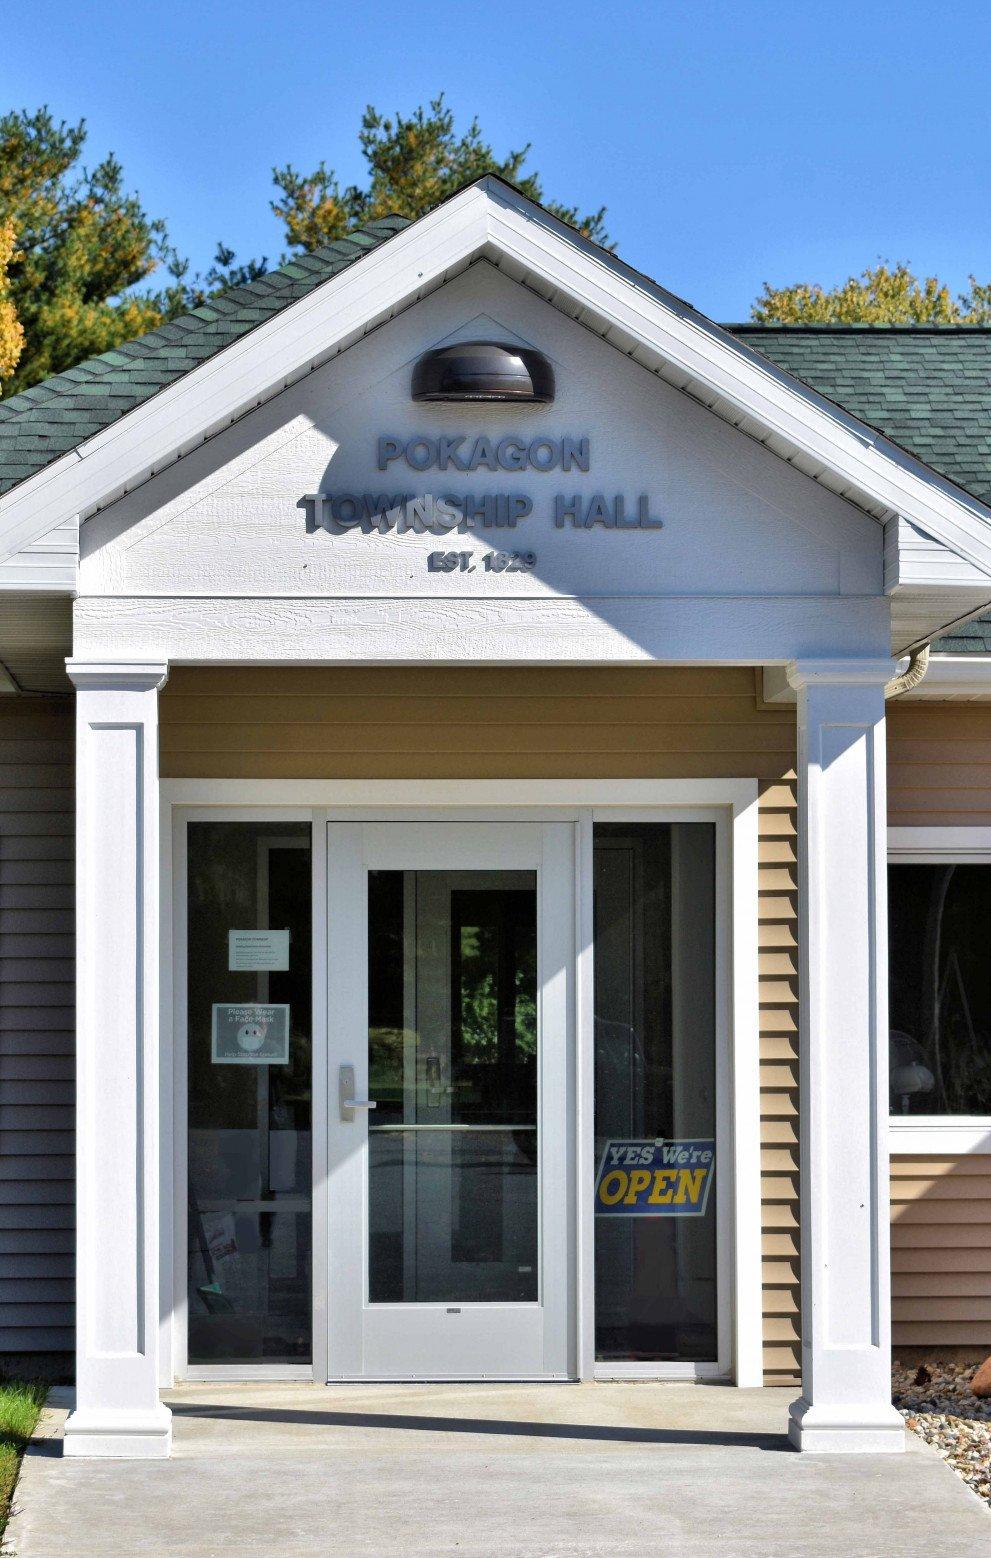 Pokagon Township Hall Front Entrance